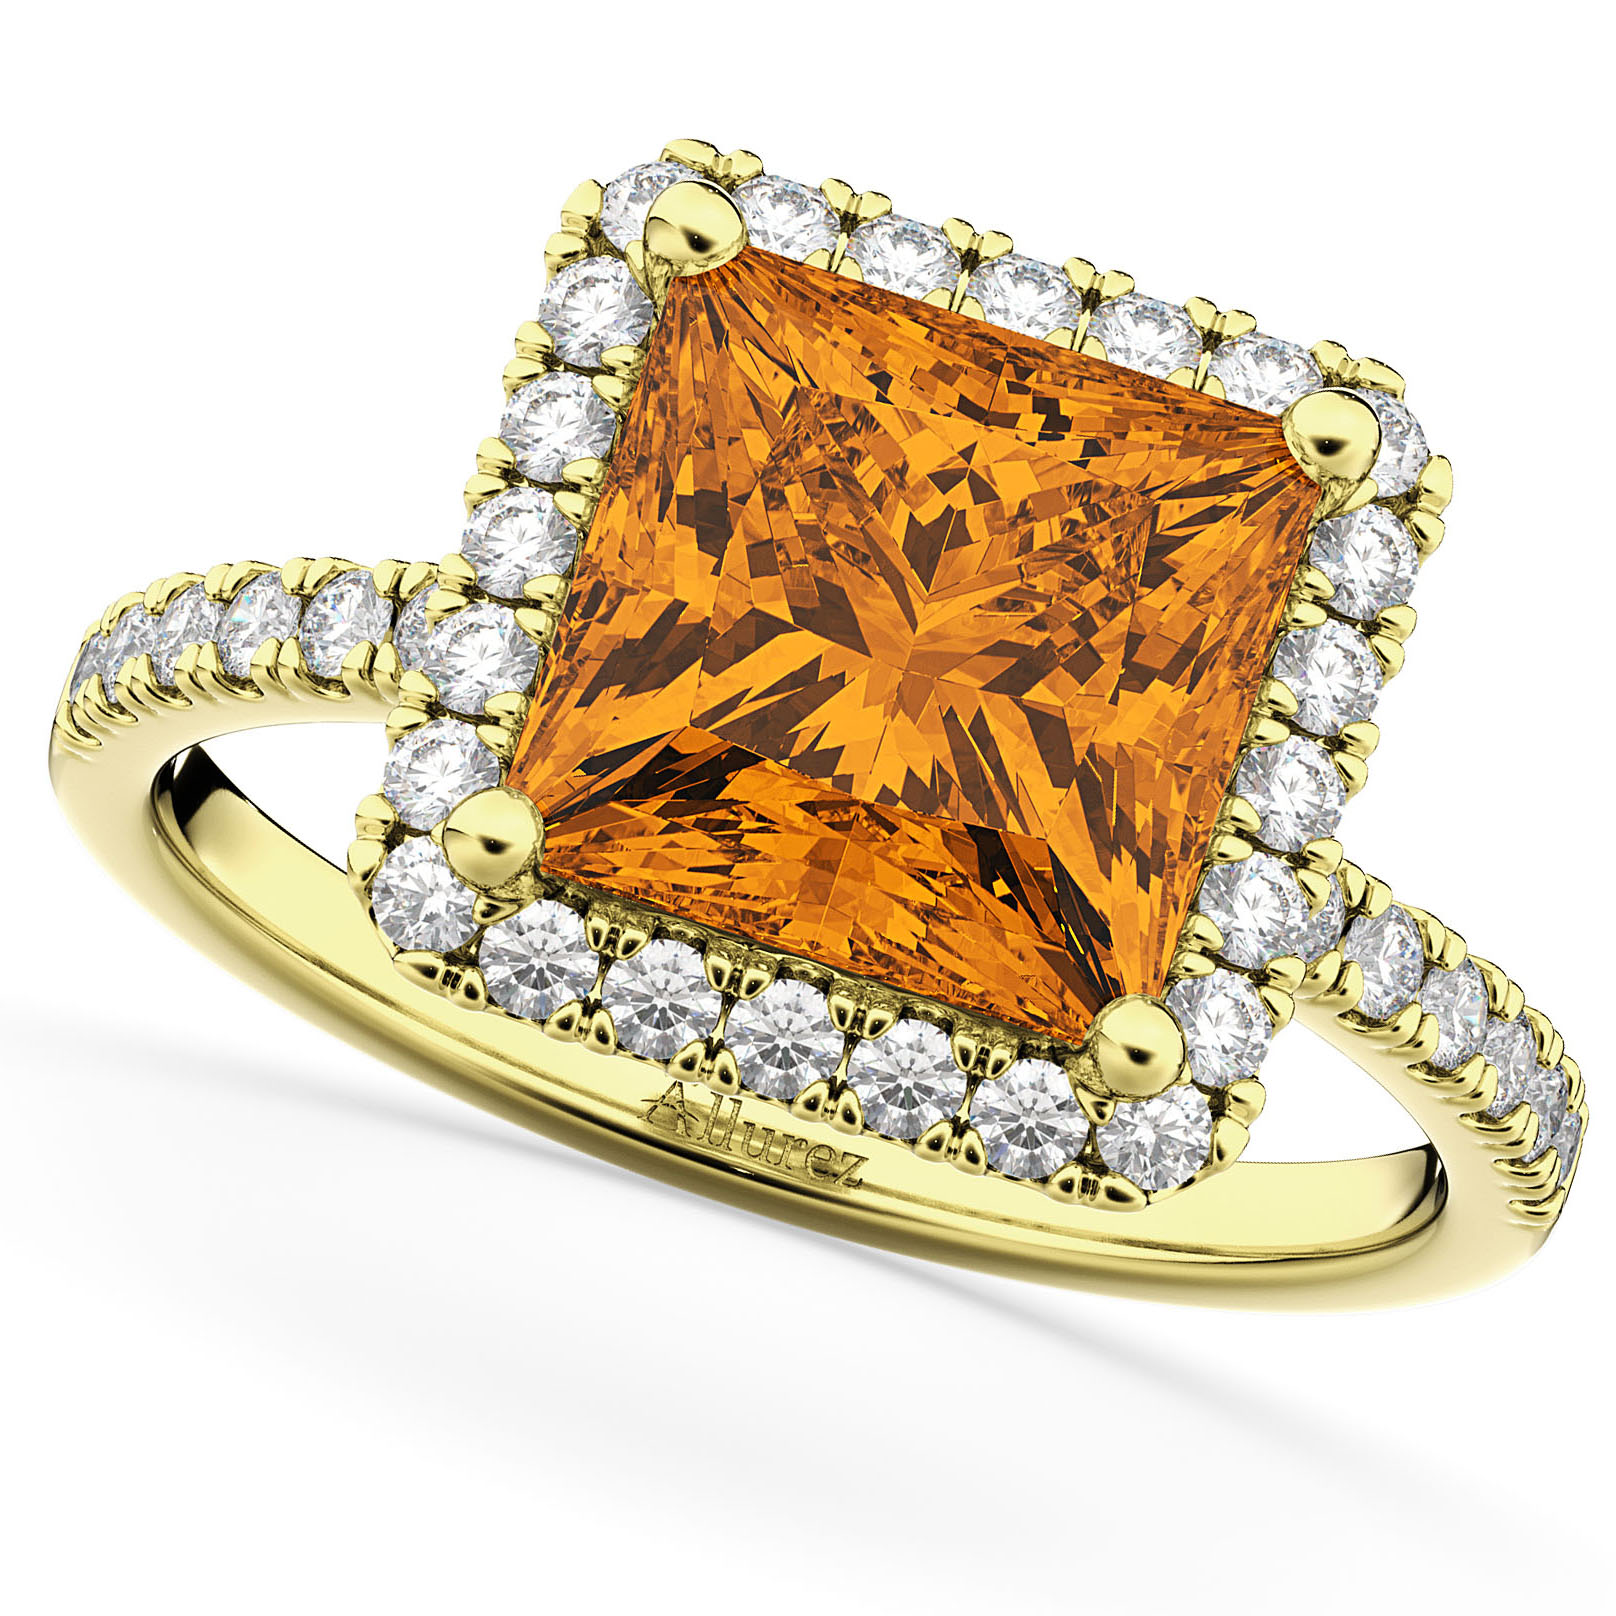 Princess Cut Halo Citrine & Diamond Engagement Ring 14K Yellow Gold 3.47ct